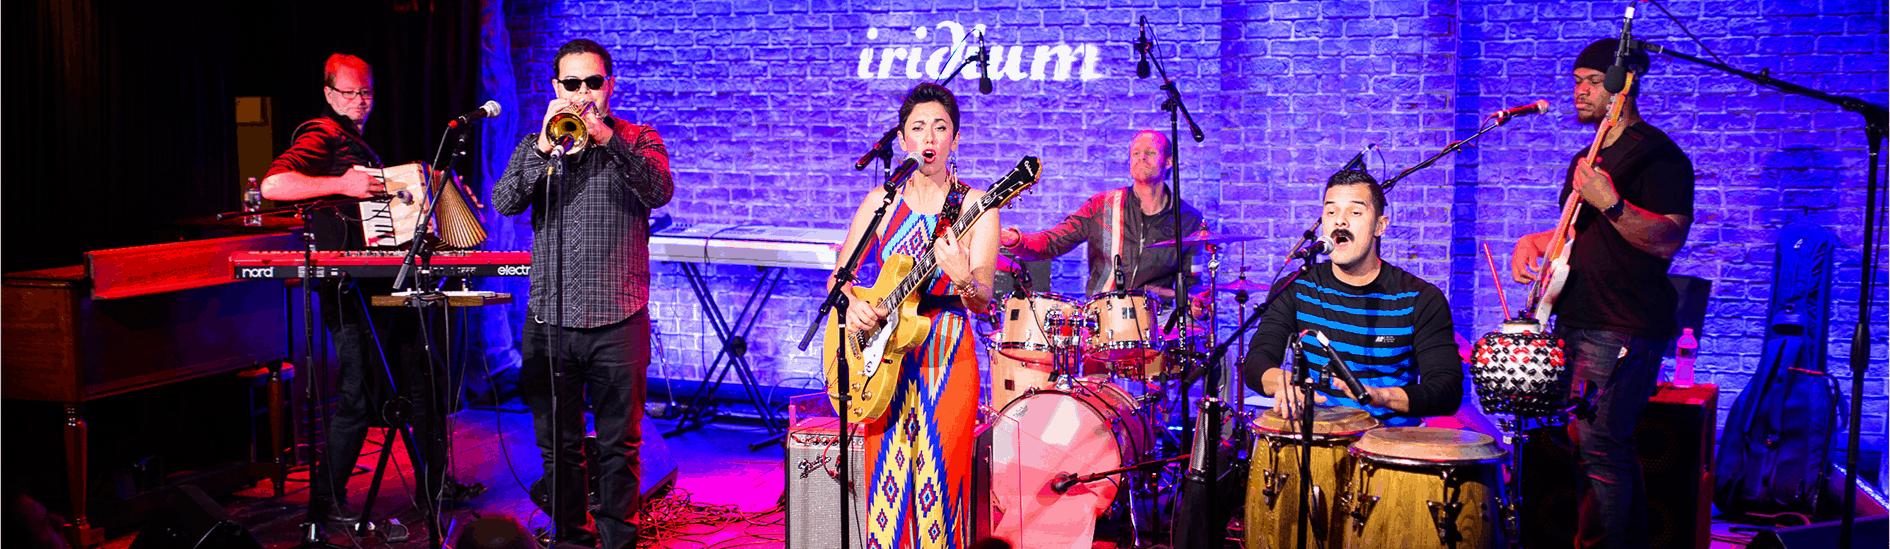 APAPNYC 2018 Showcase Gina Chavez at Iridium by Adam Kissick/APAP